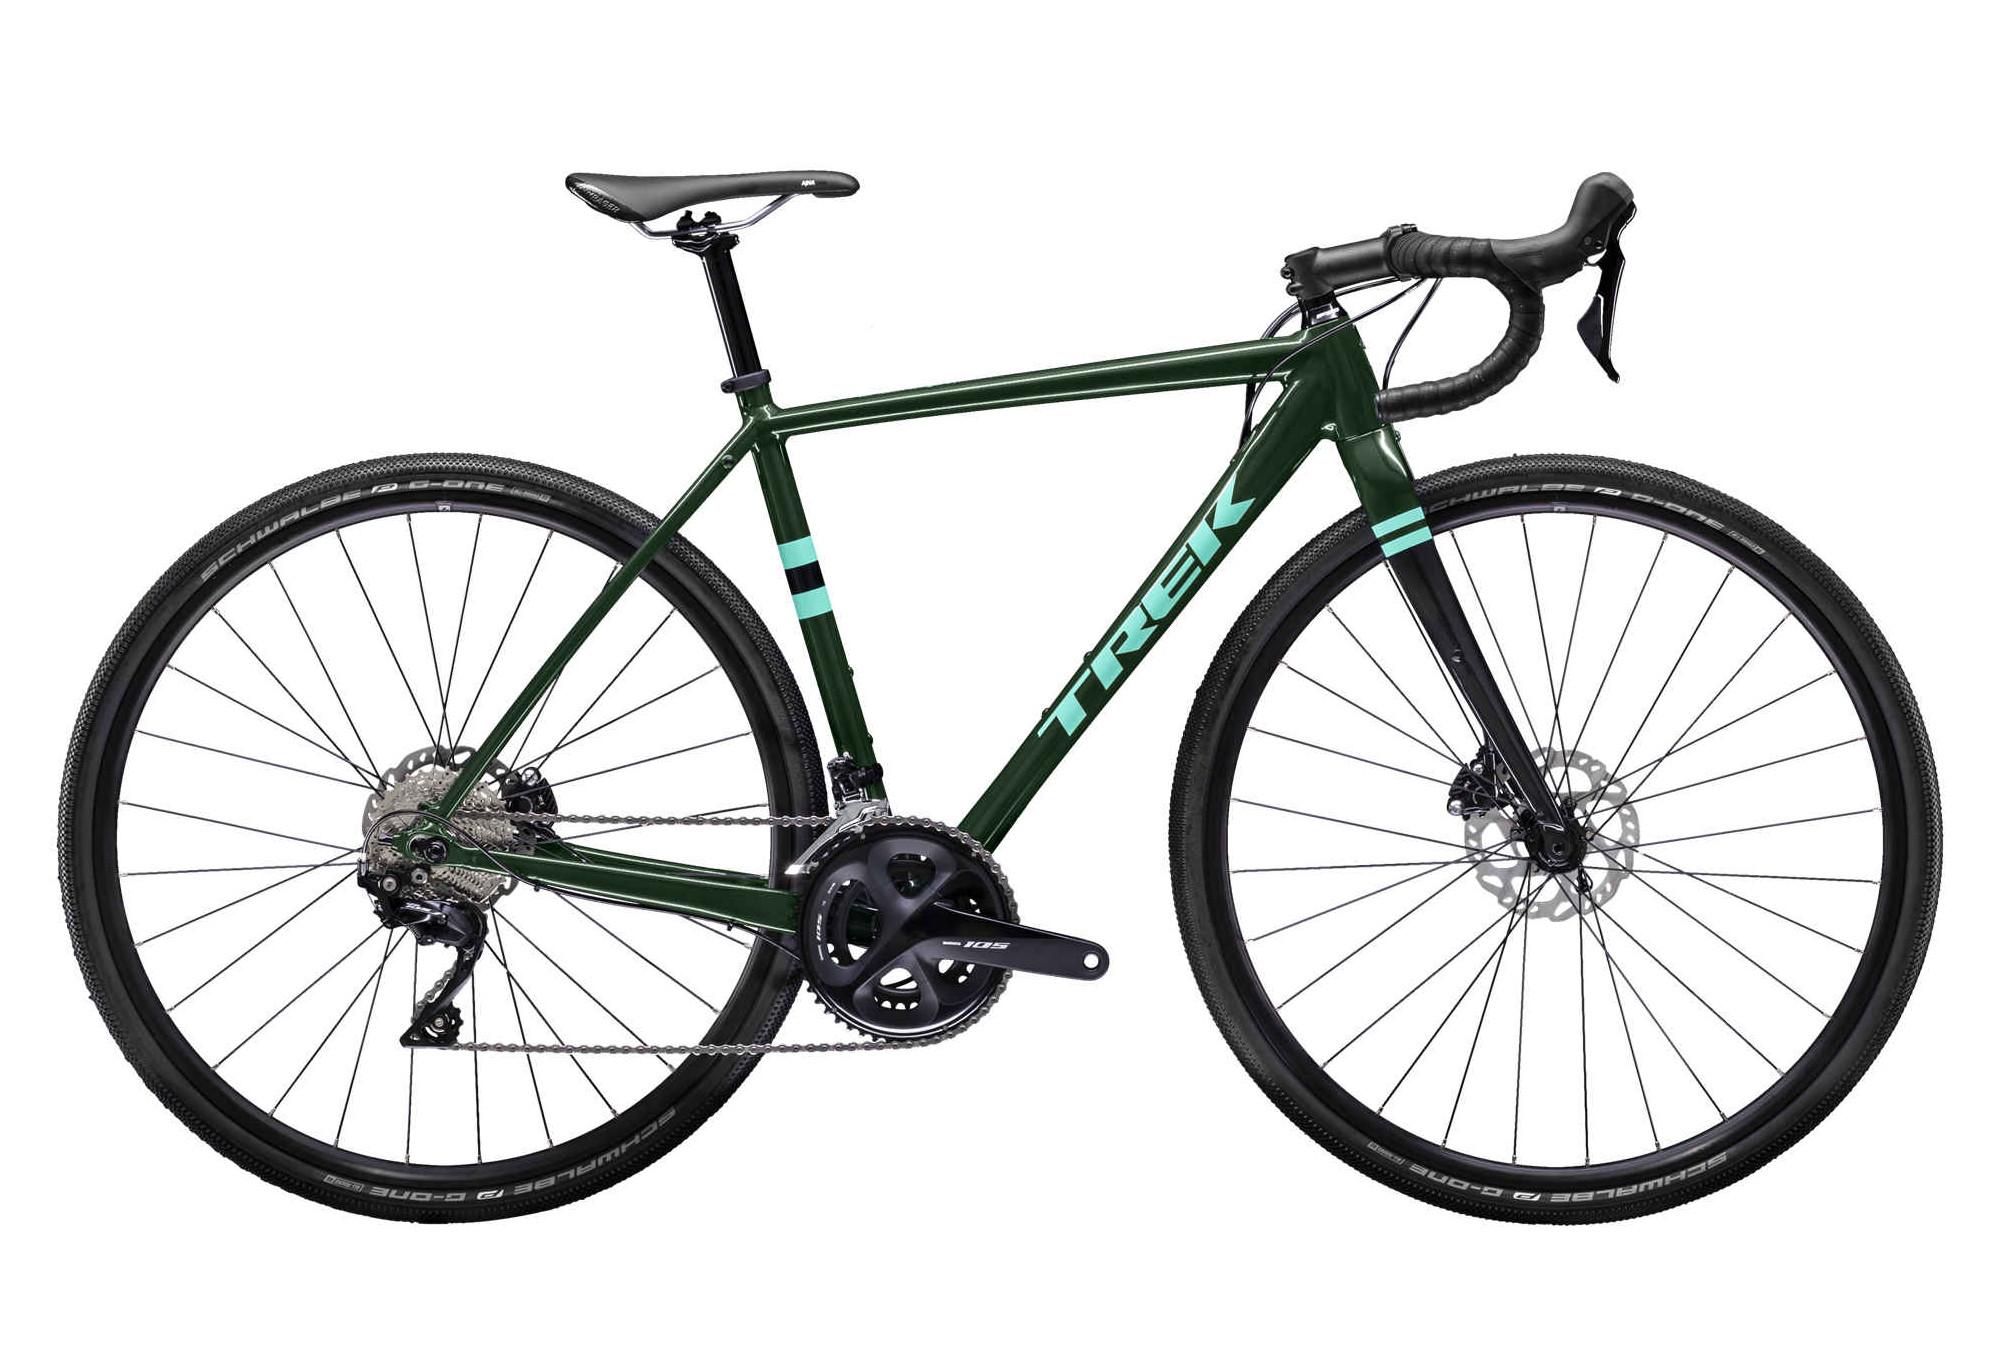 Trek Checkpoint ALR 5 Gravel Bike 2020 Shimano 105 11S Green